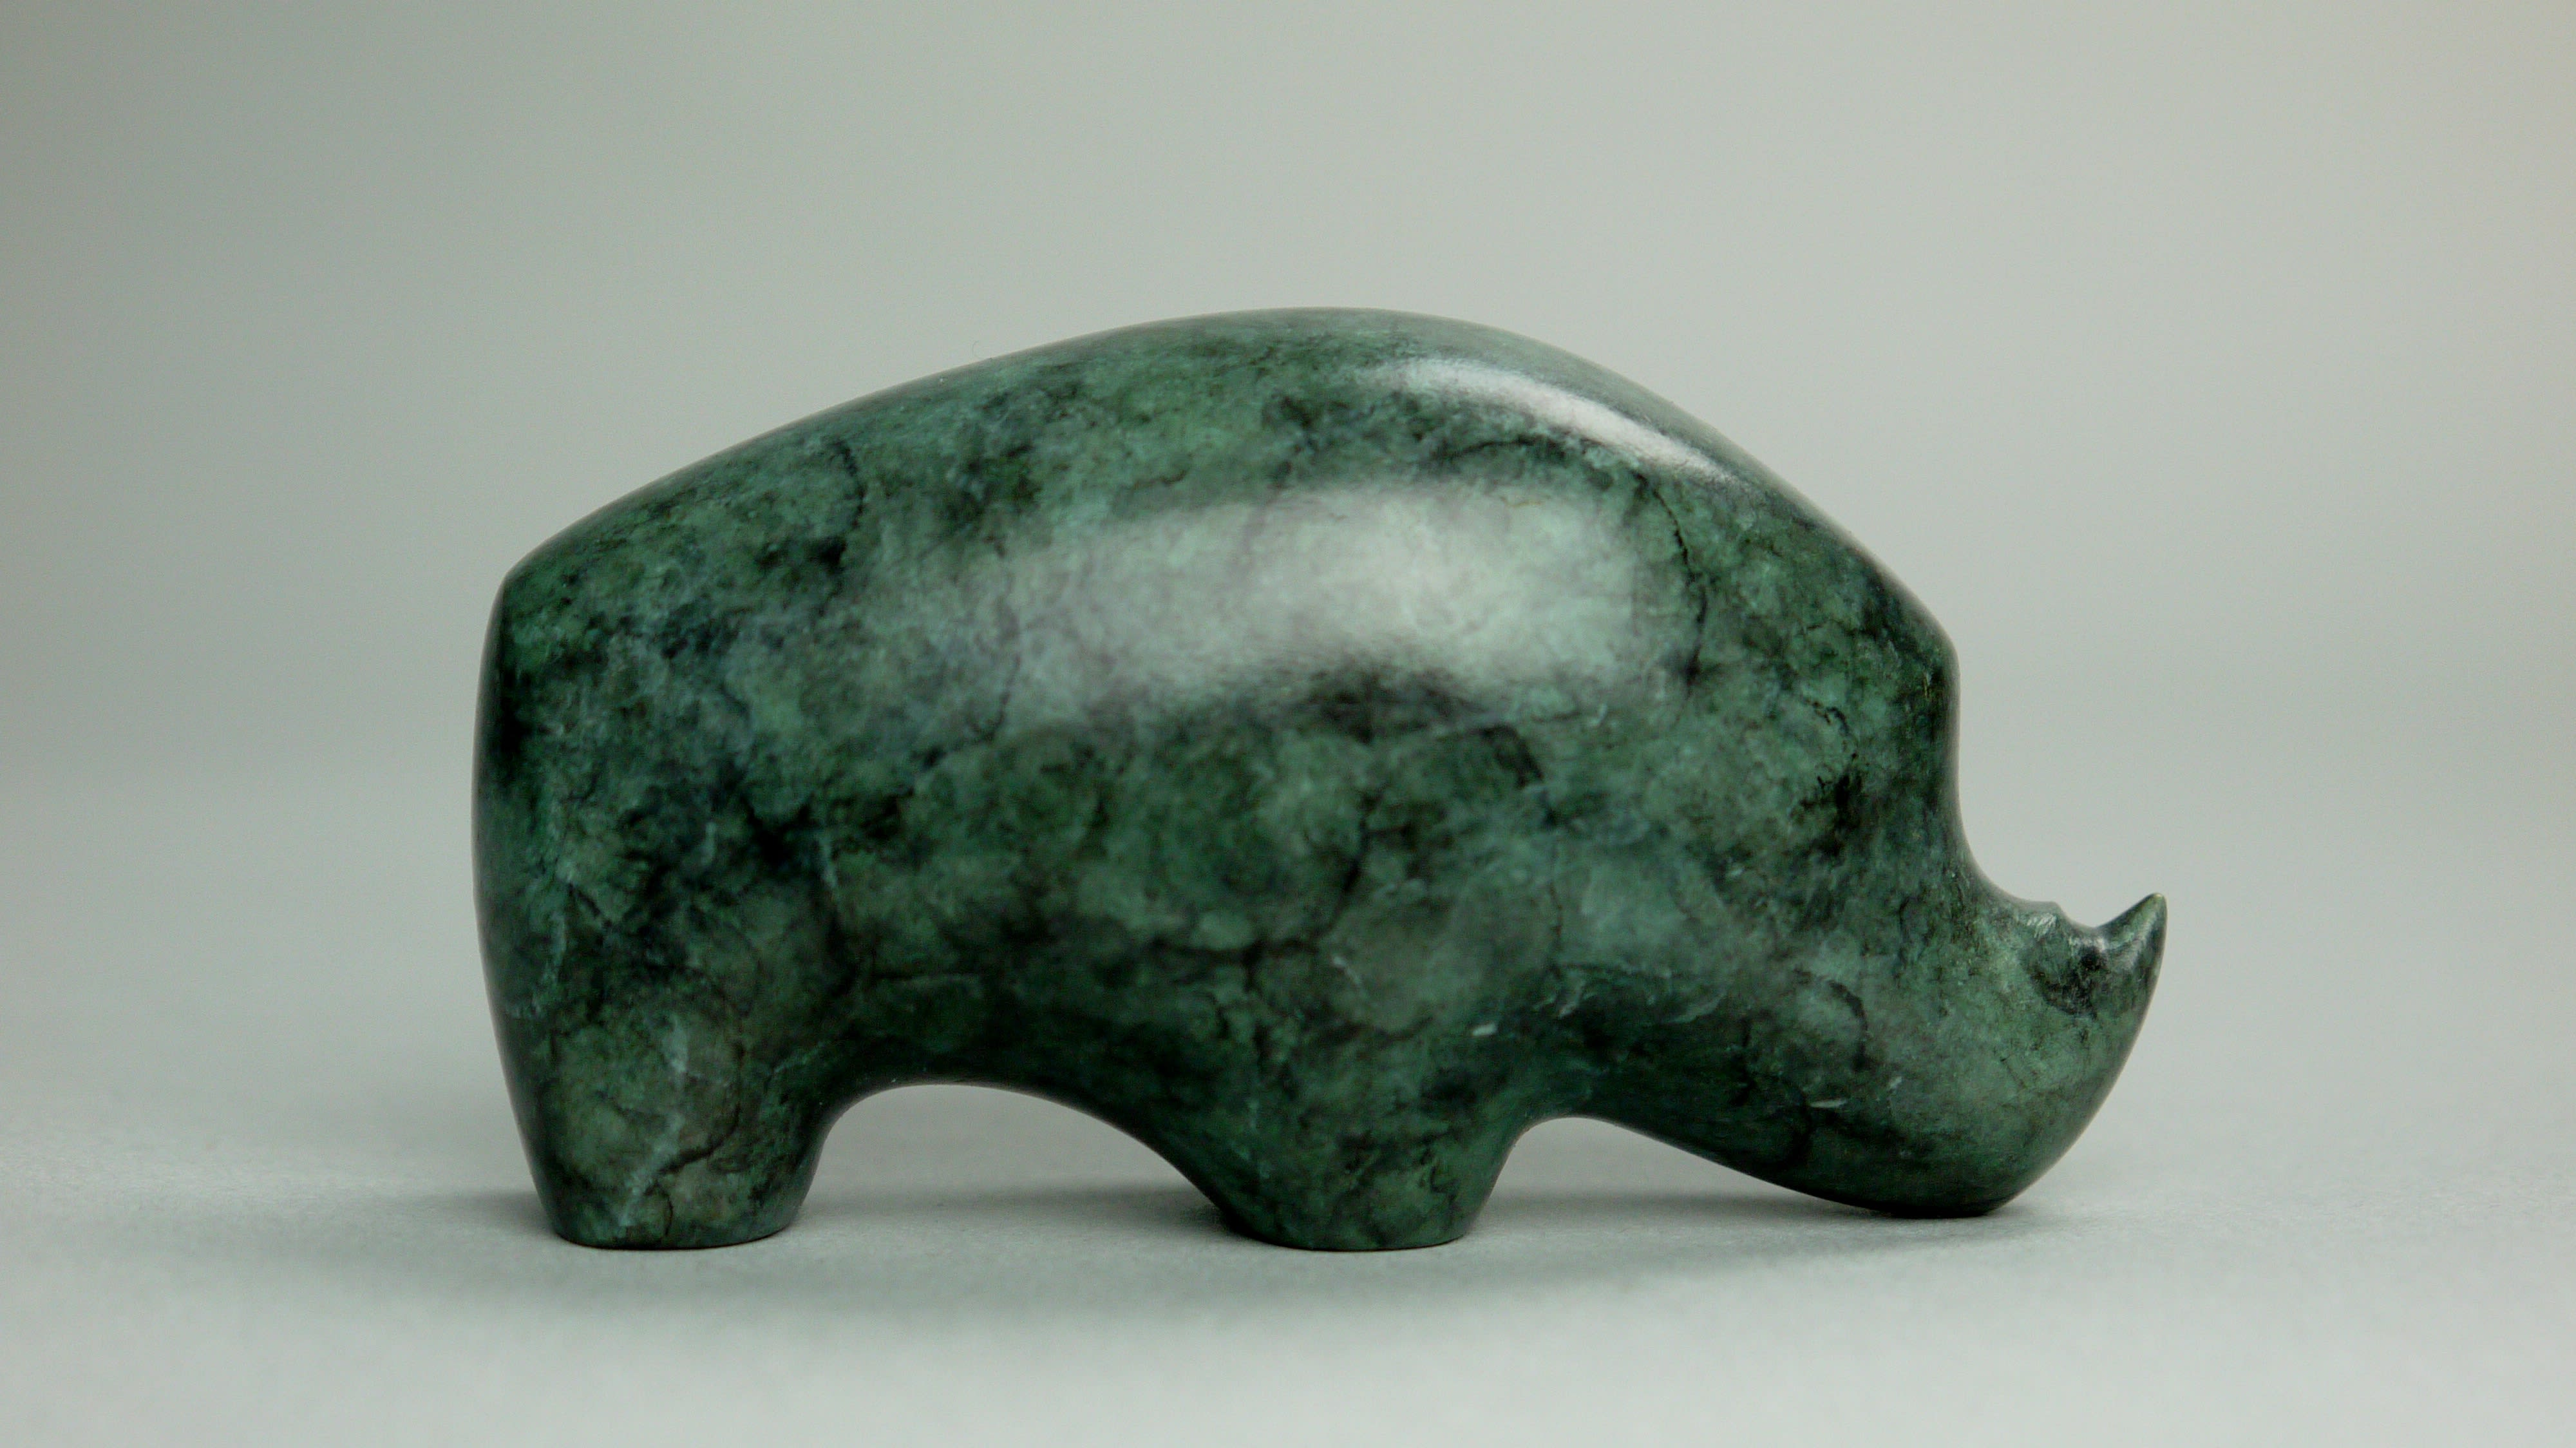 Stephen Page Rhino